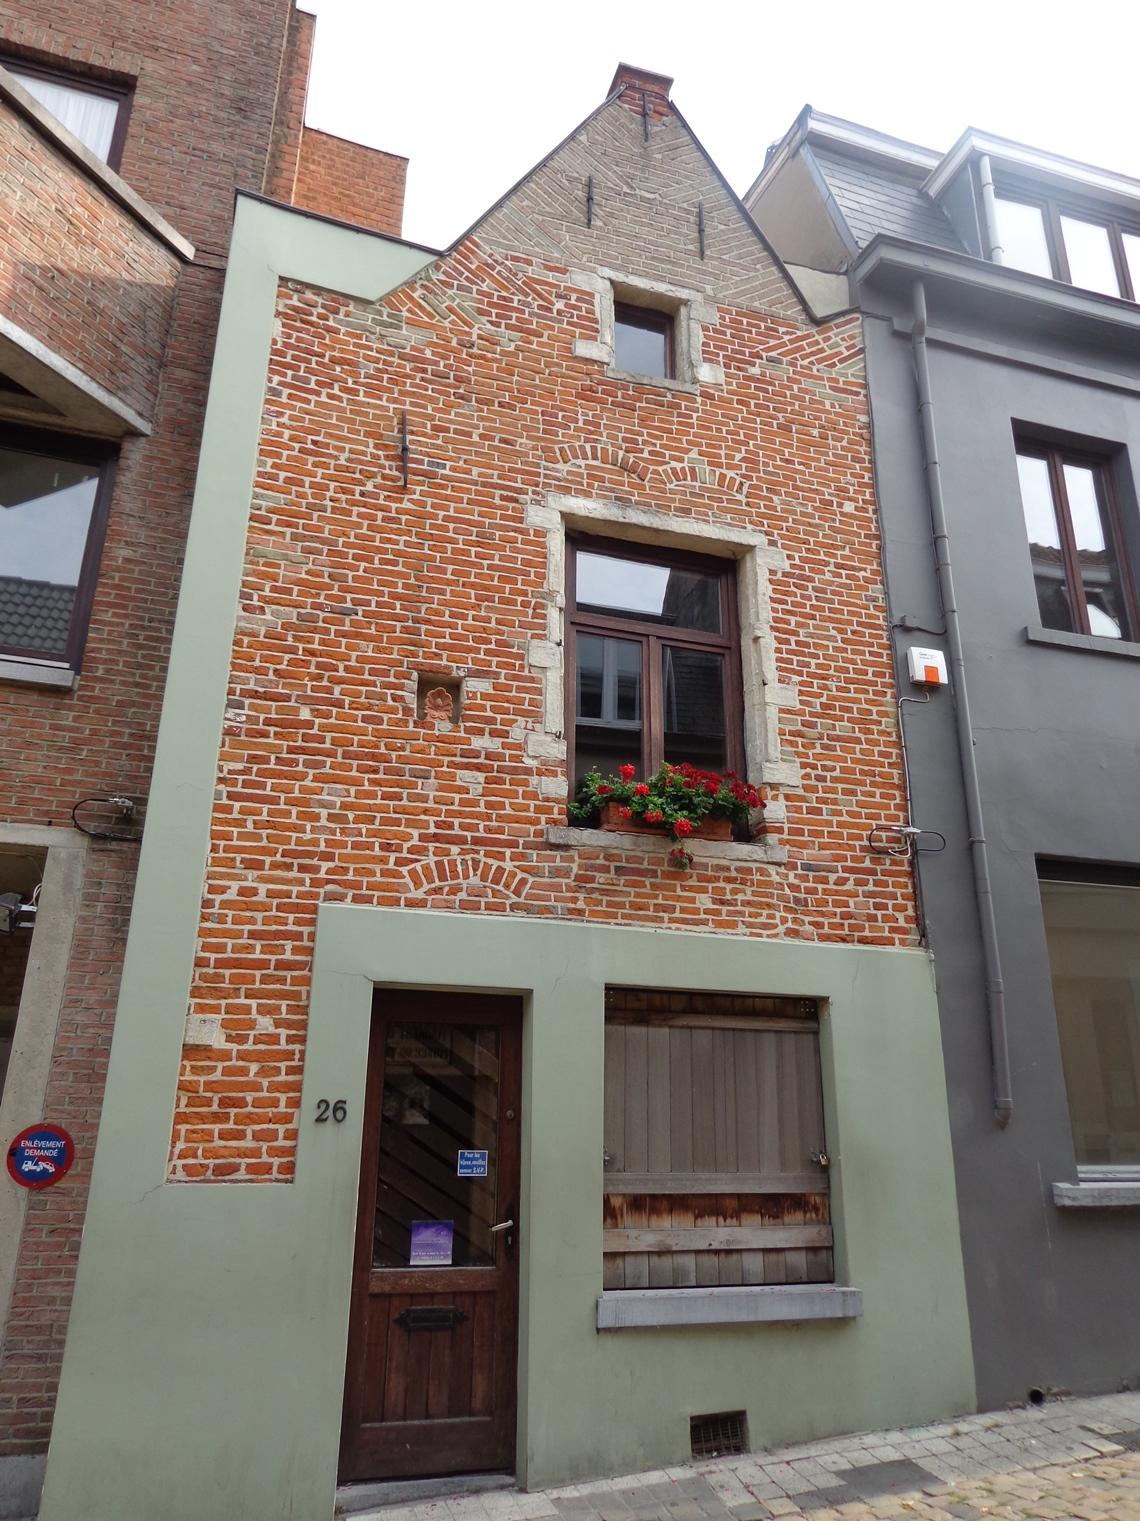 Rue des Renards 26, 2015